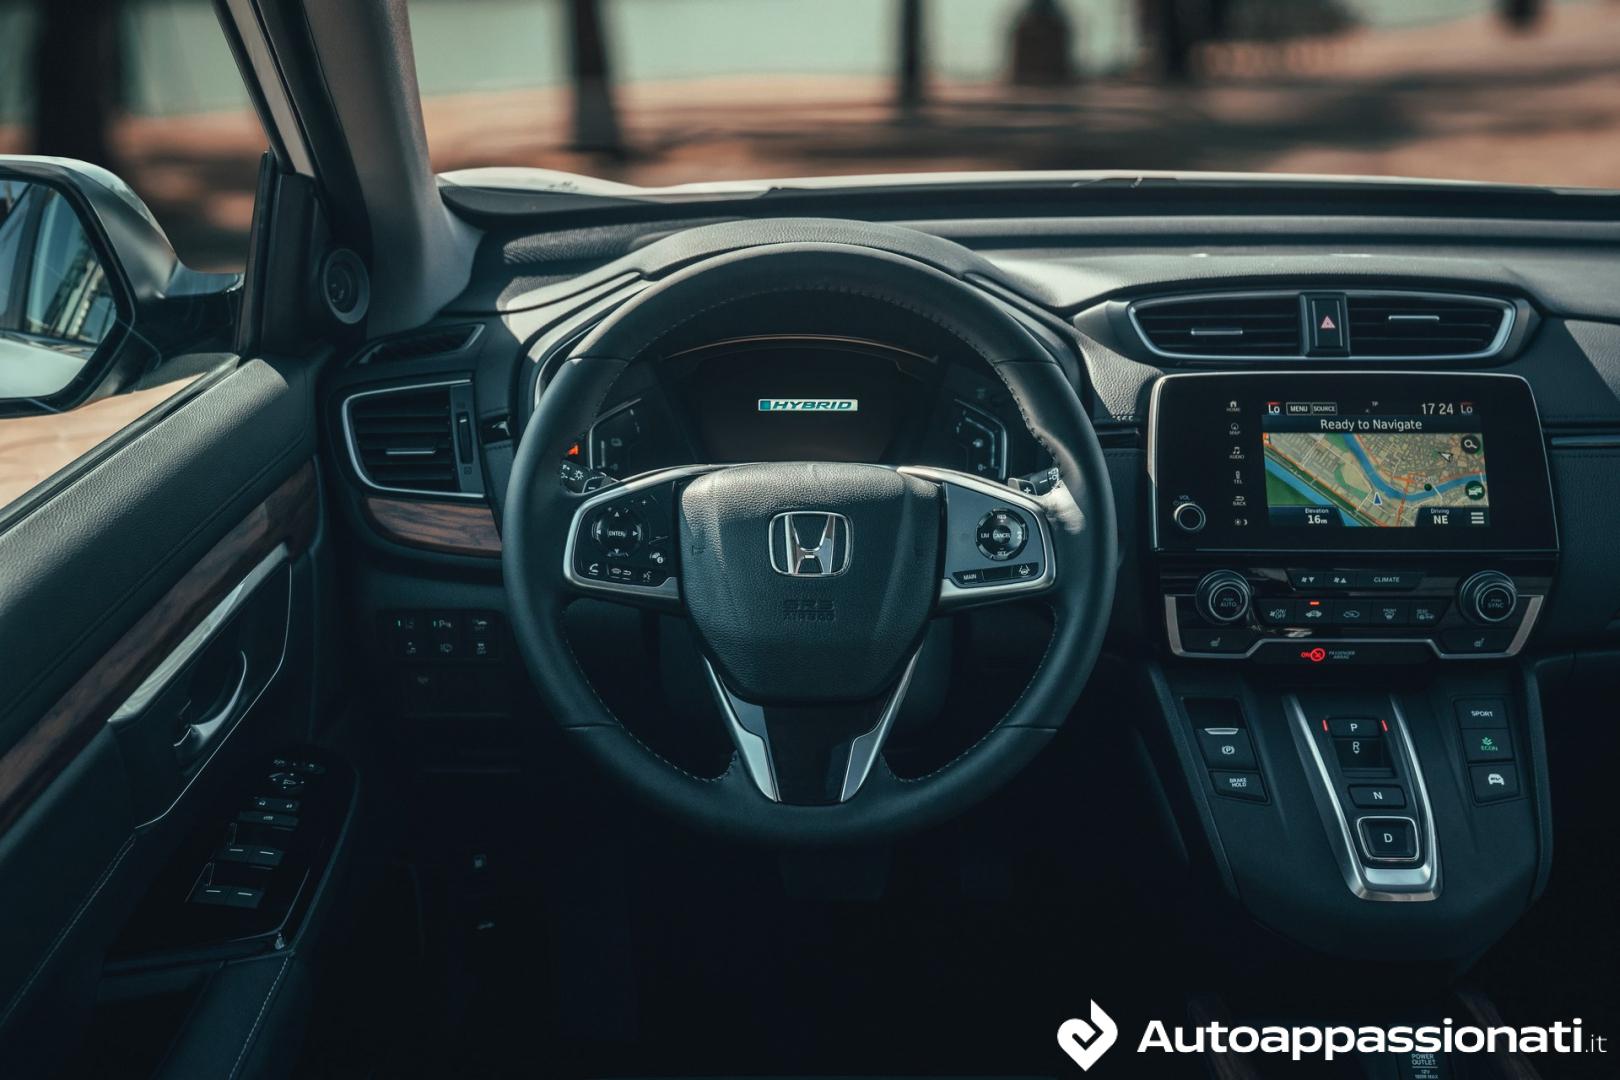 Temple Of Vtec >> Honda Cr V Hybrid Consumi Temple Of Vtec Rumors And News